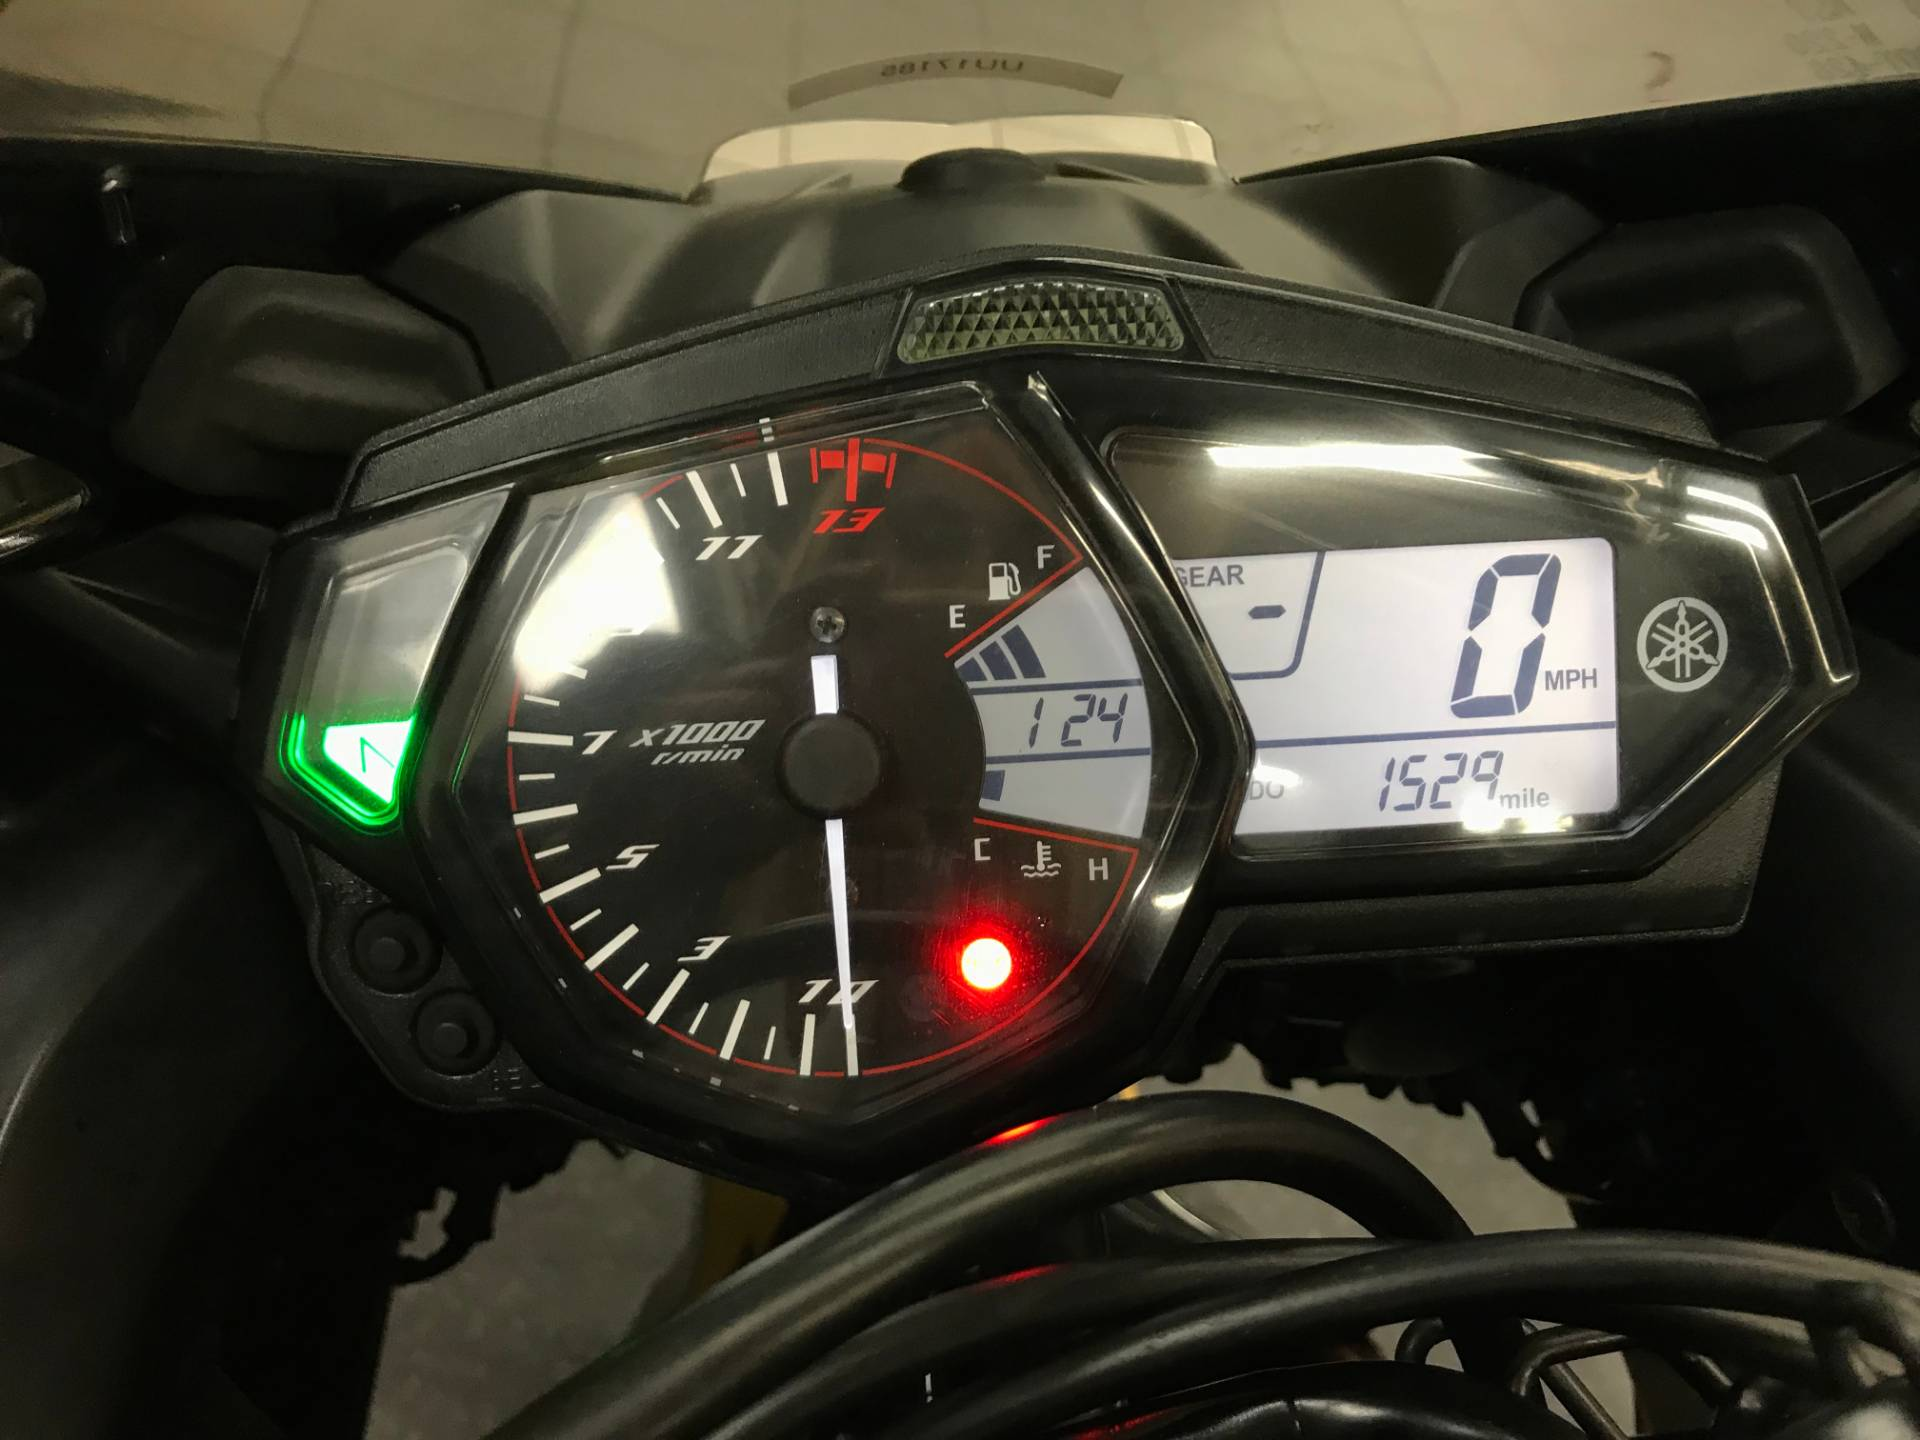 2015 Yamaha YZF-R3 5